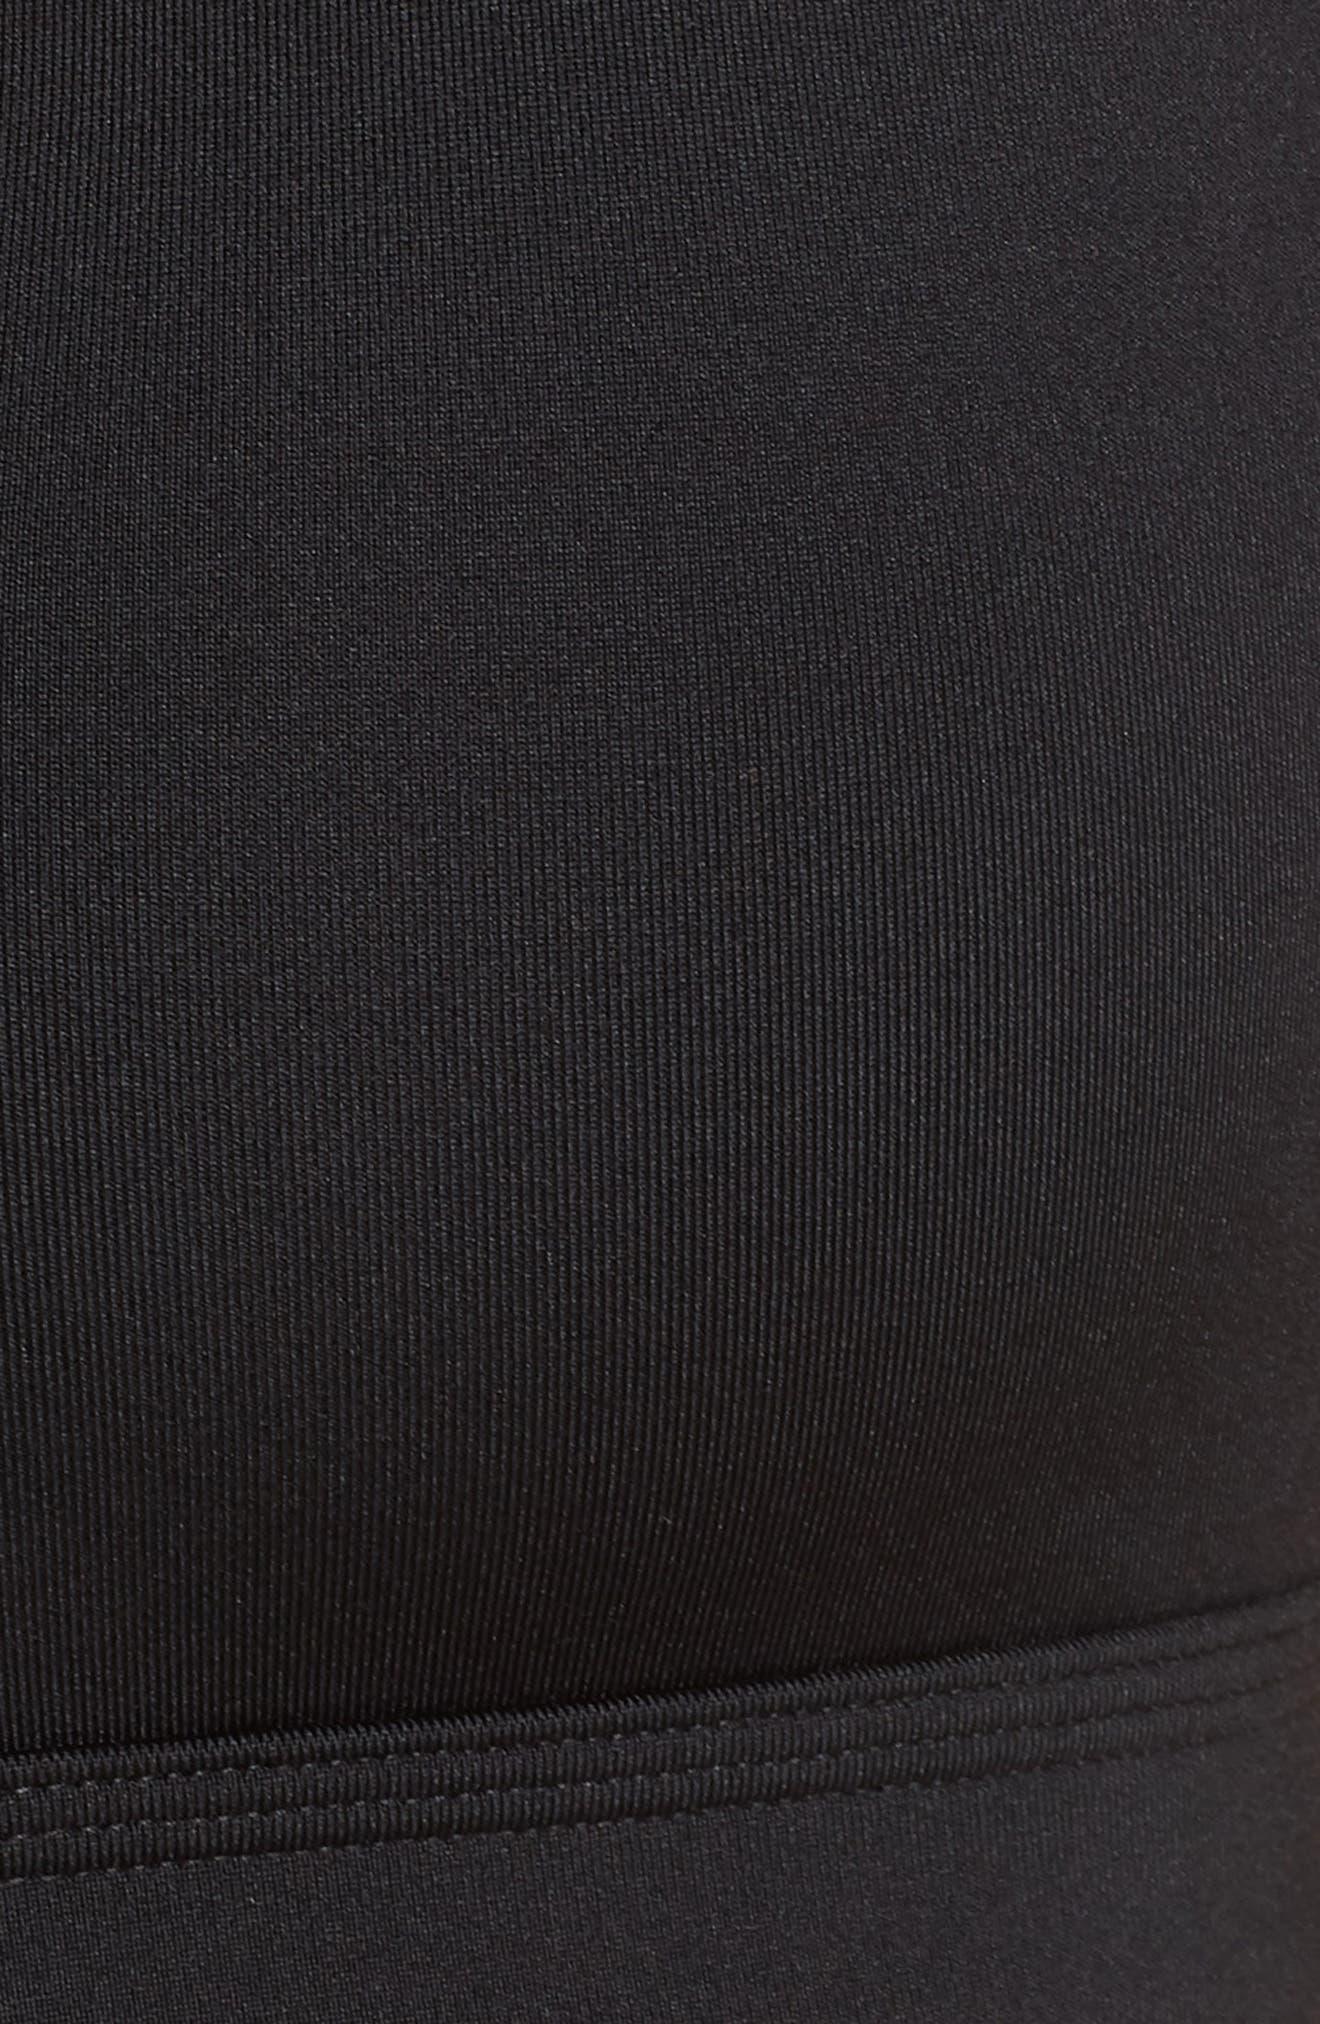 Indy Dry Cutout Sports Bra,                             Alternate thumbnail 6, color,                             BLACK/ WHITE